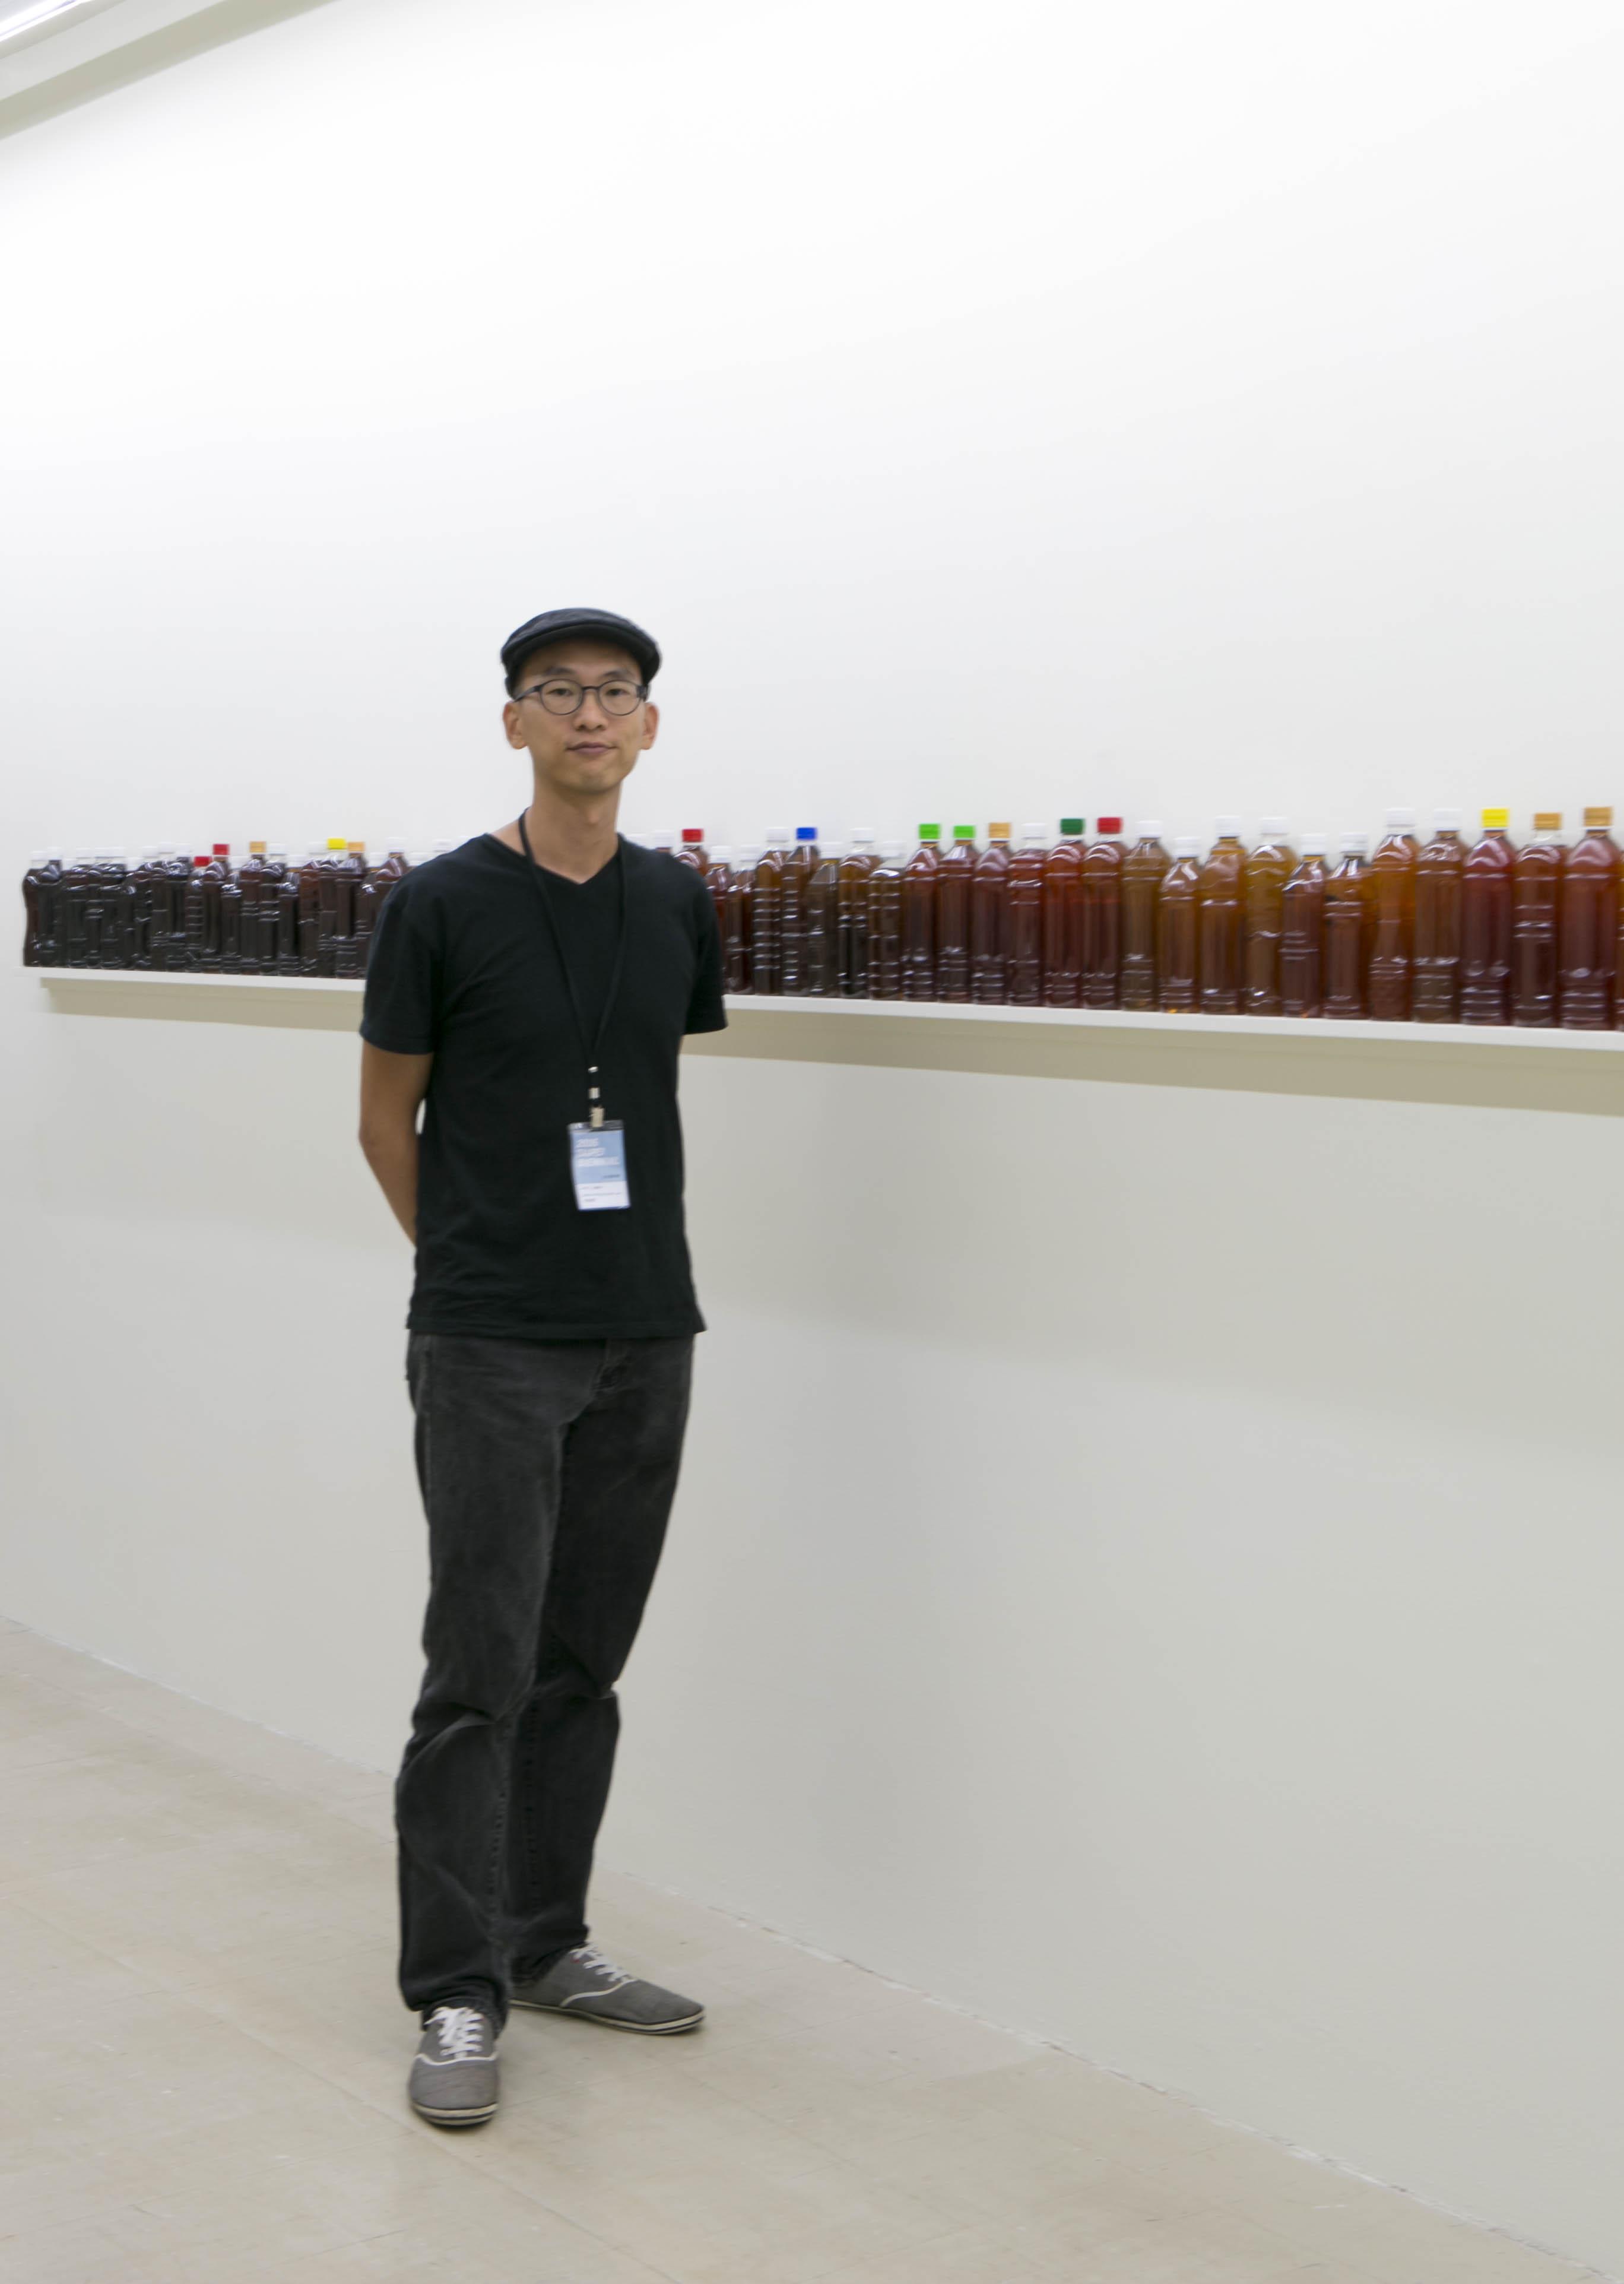 Ming-Hsueh Li to present his work in 2016 Taipei Biennial